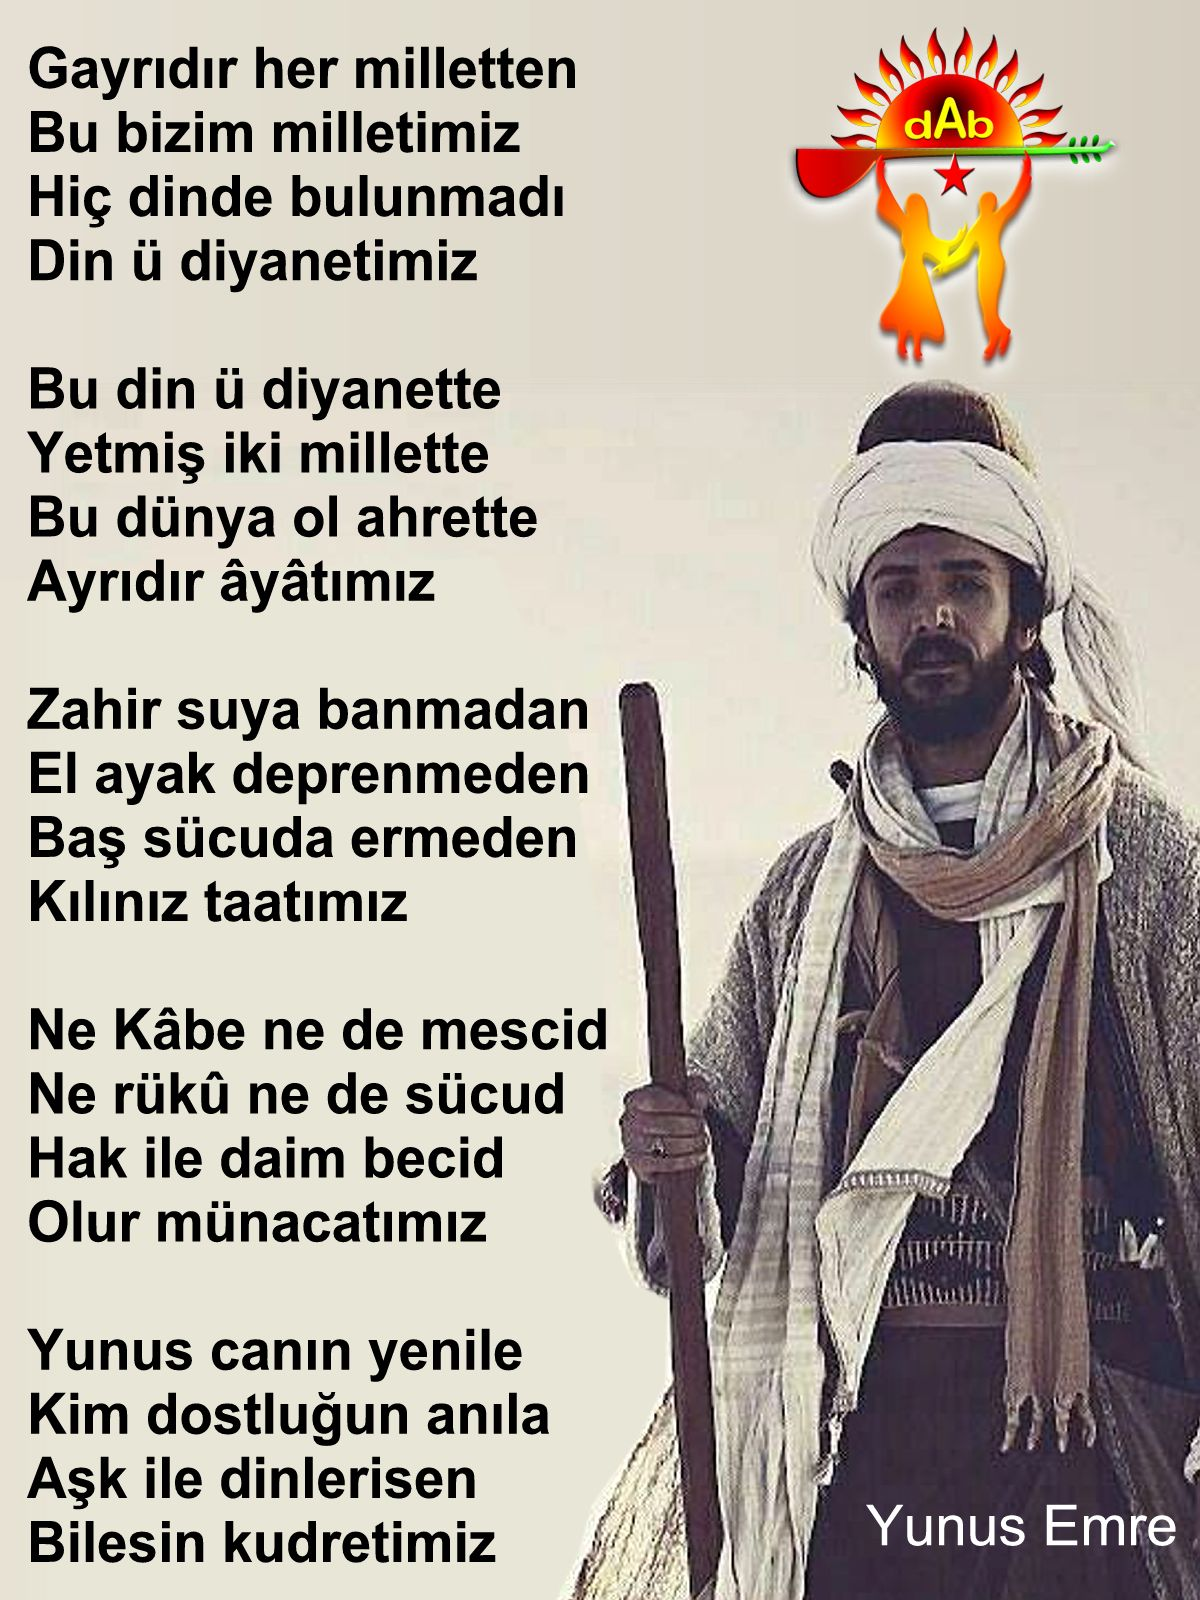 Alevi Bektaşi Kızılbaş Pir Sultan Devrimci Aleviler Birliği DAB haram yunus emre